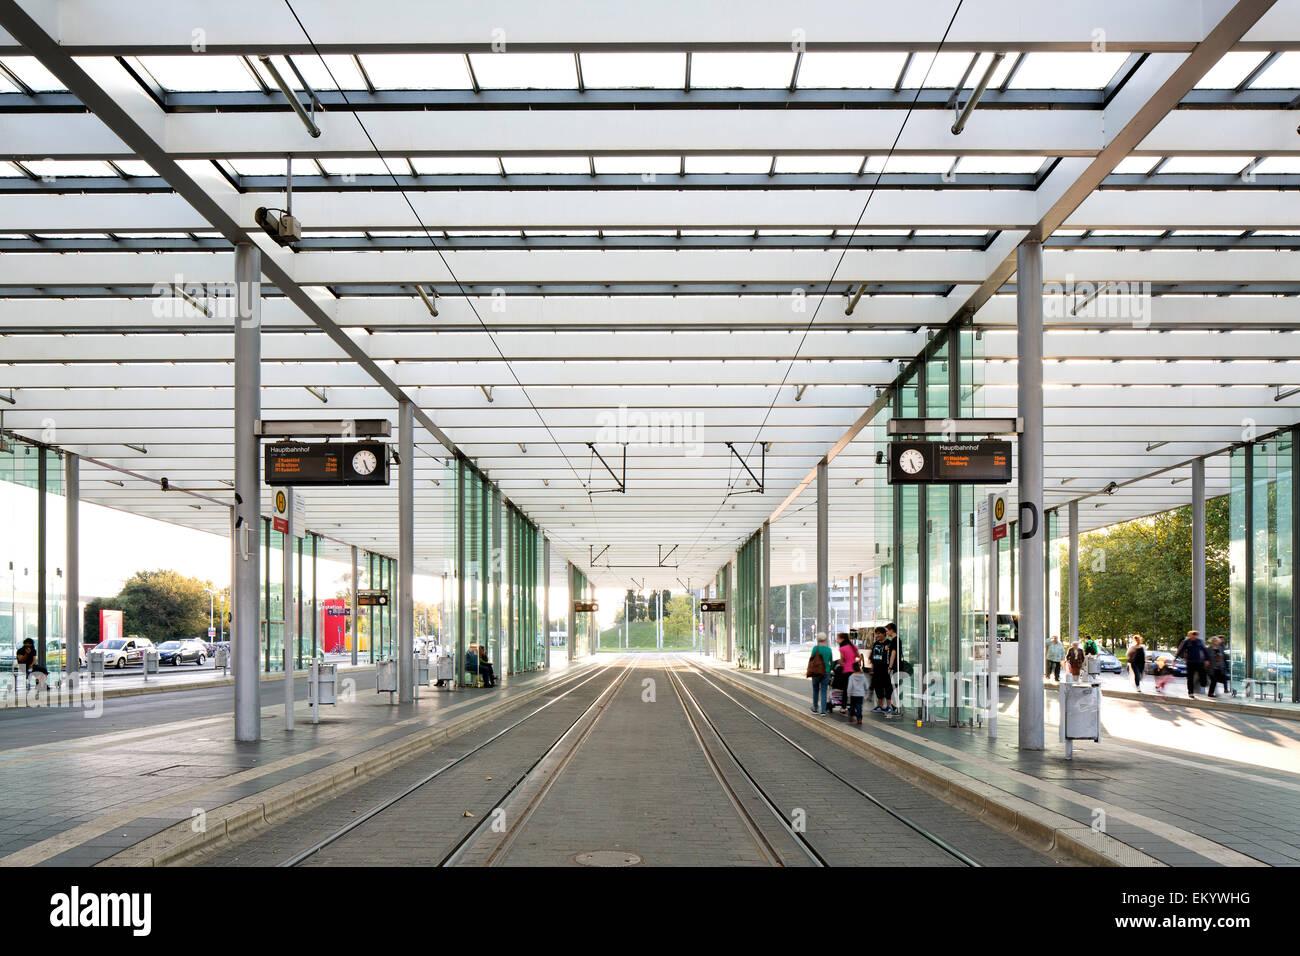 Main station, Braunschweig, Lower Saxony, Germany - Stock Image